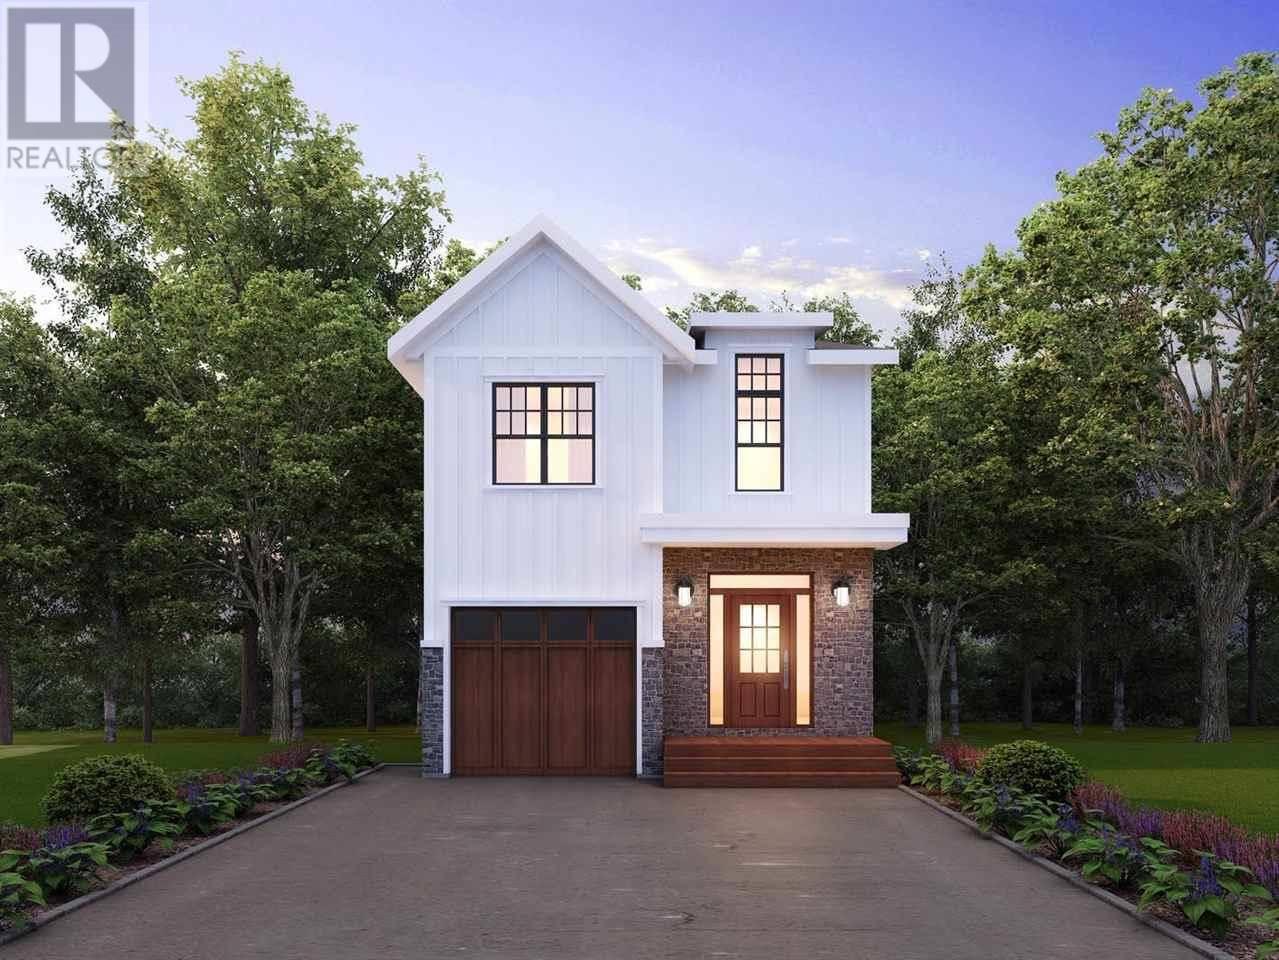 House for sale at 35 Darjeeling Dr Unit 421 Halifax Nova Scotia - MLS: 201917349